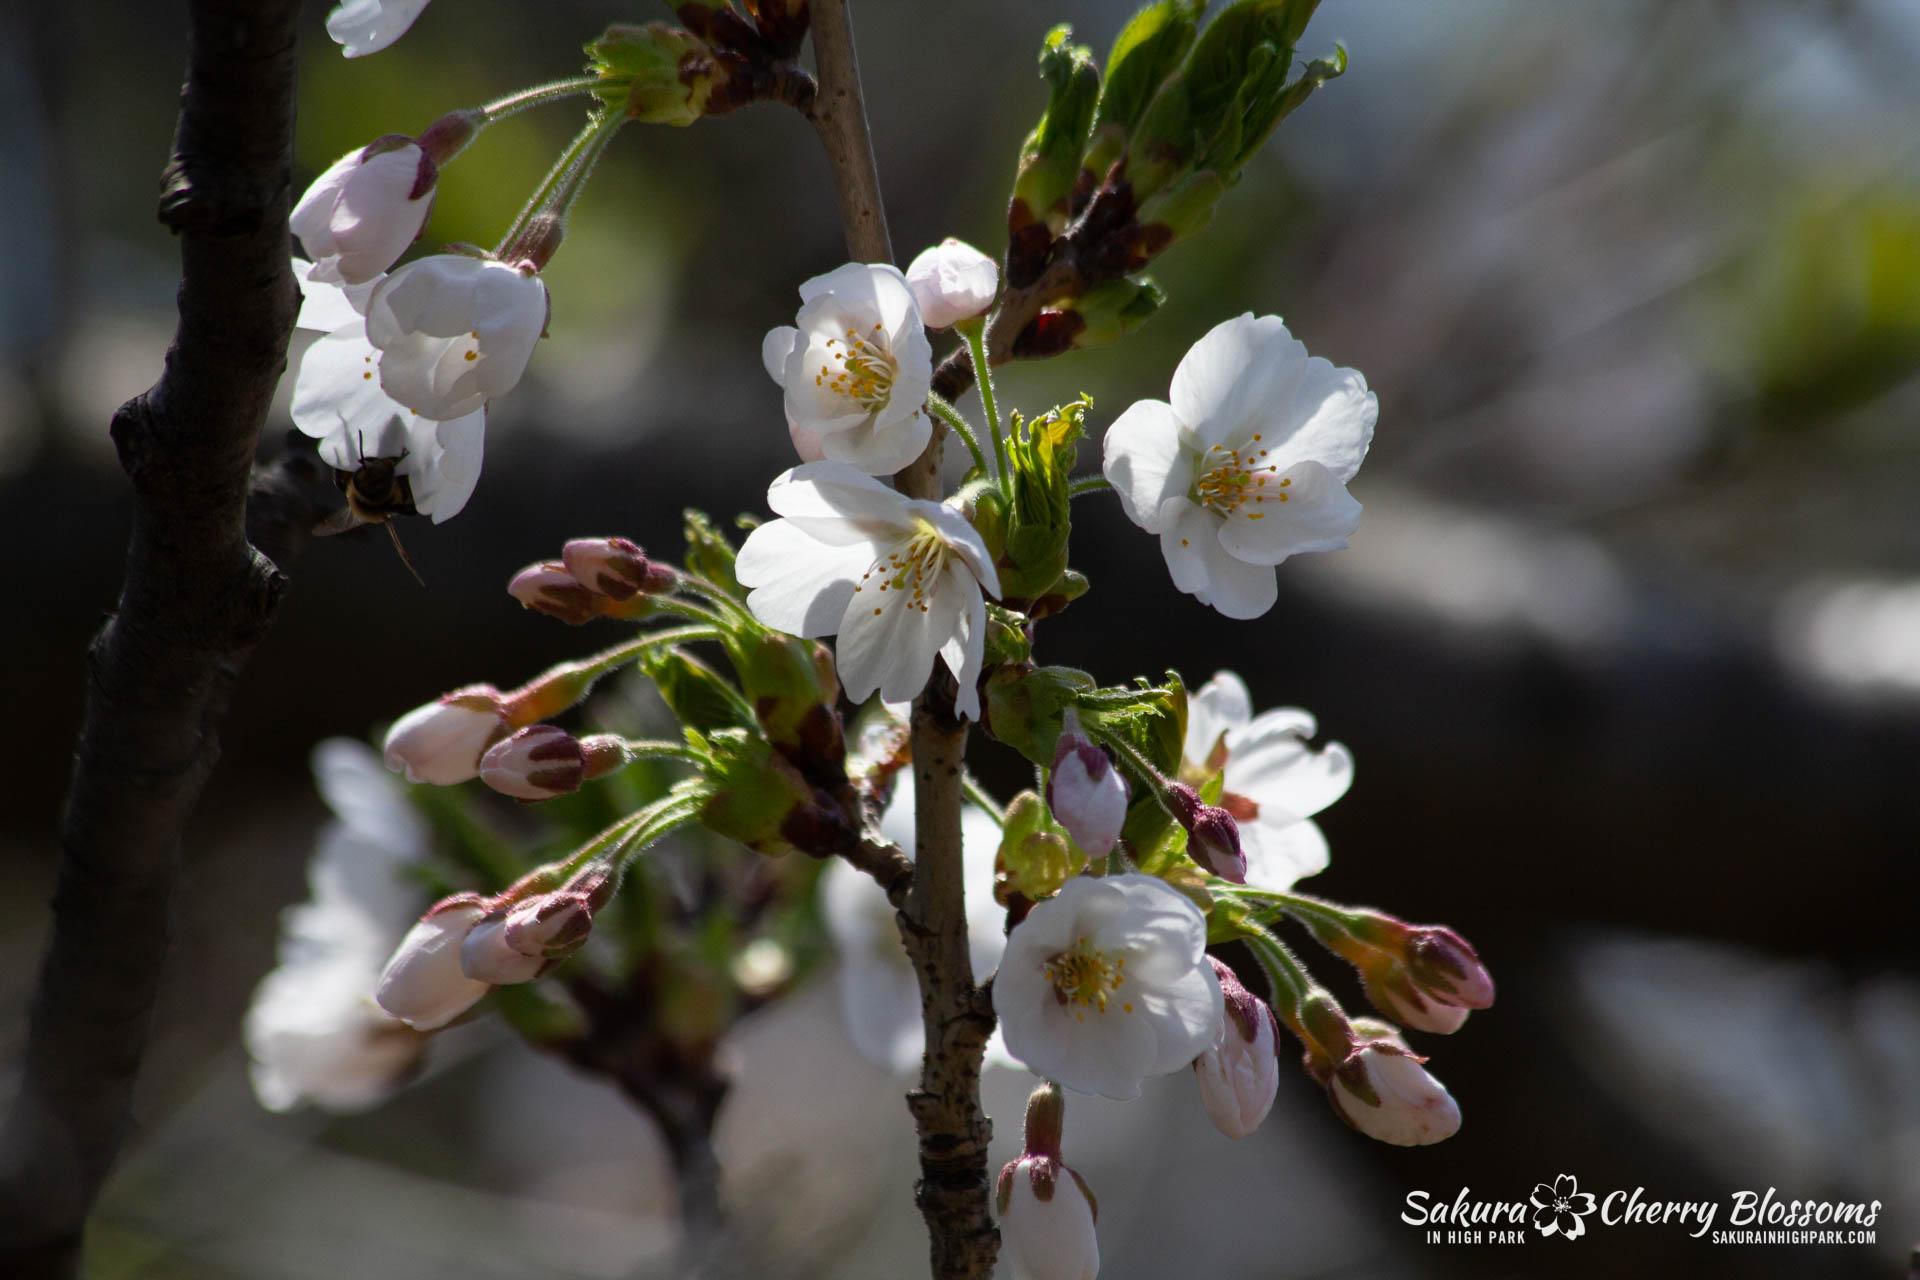 Sakura-Watch-May-5-2018-139.jpg